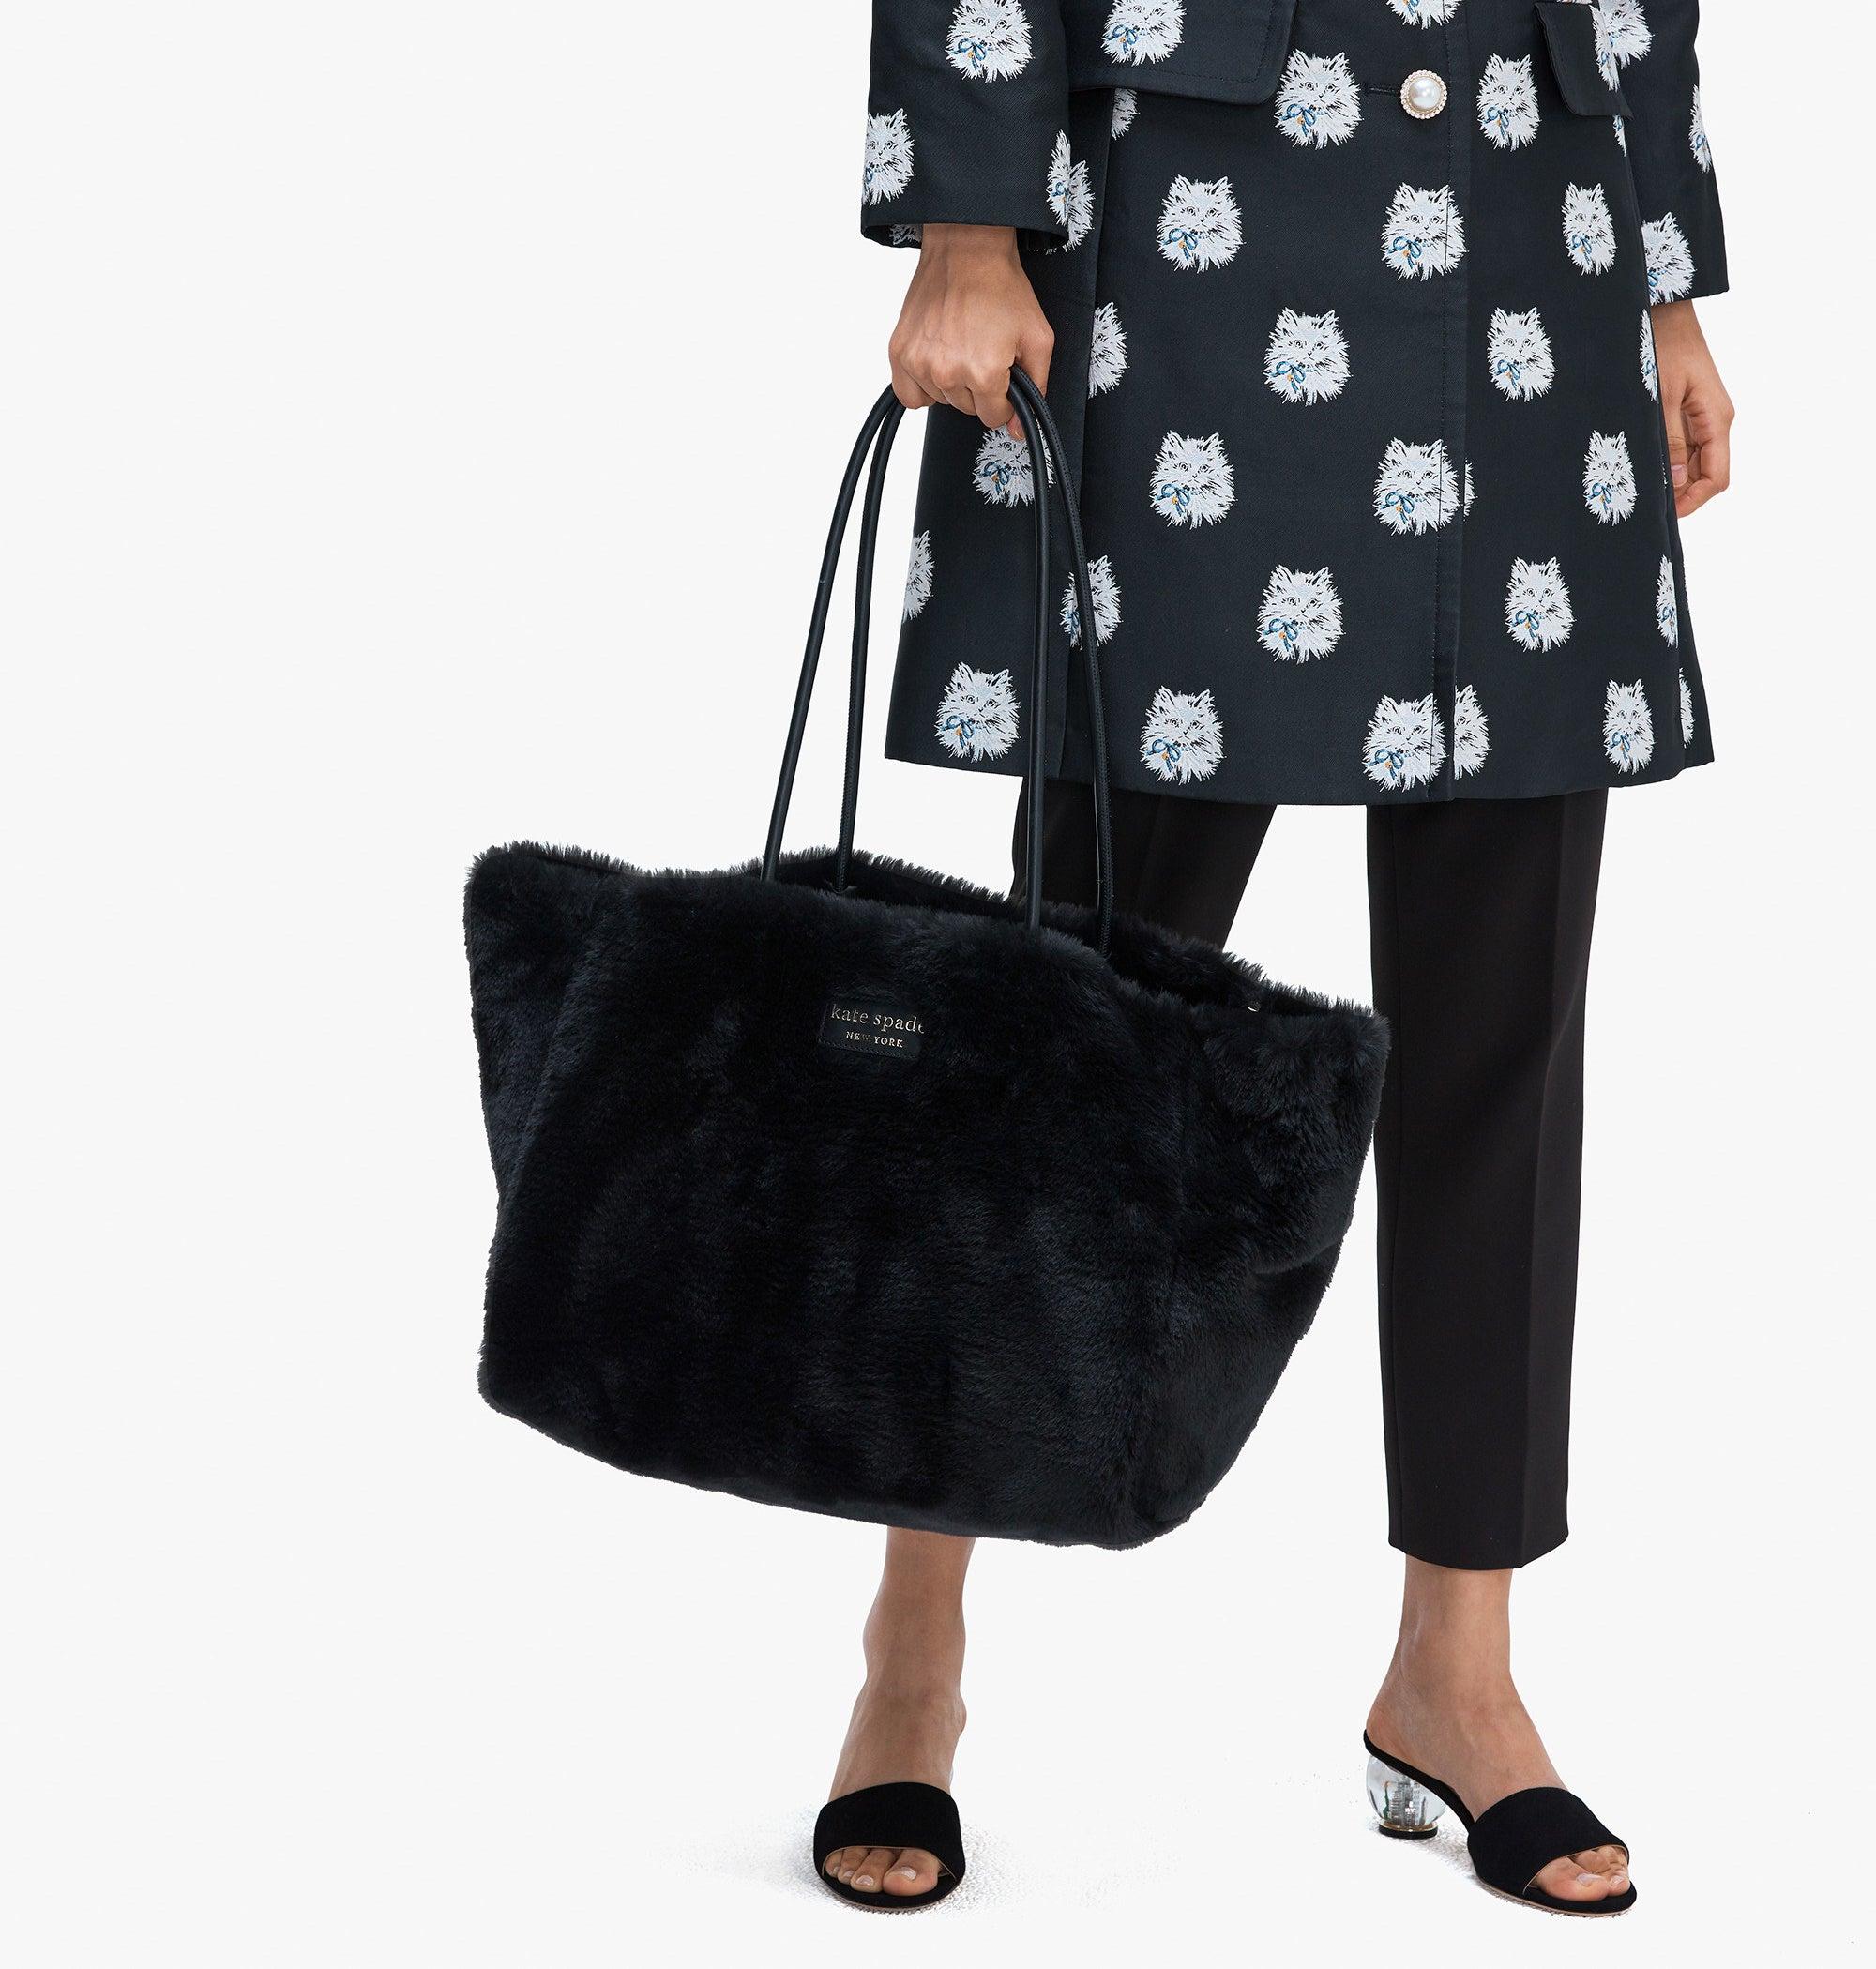 Model holding the black faux fur bag